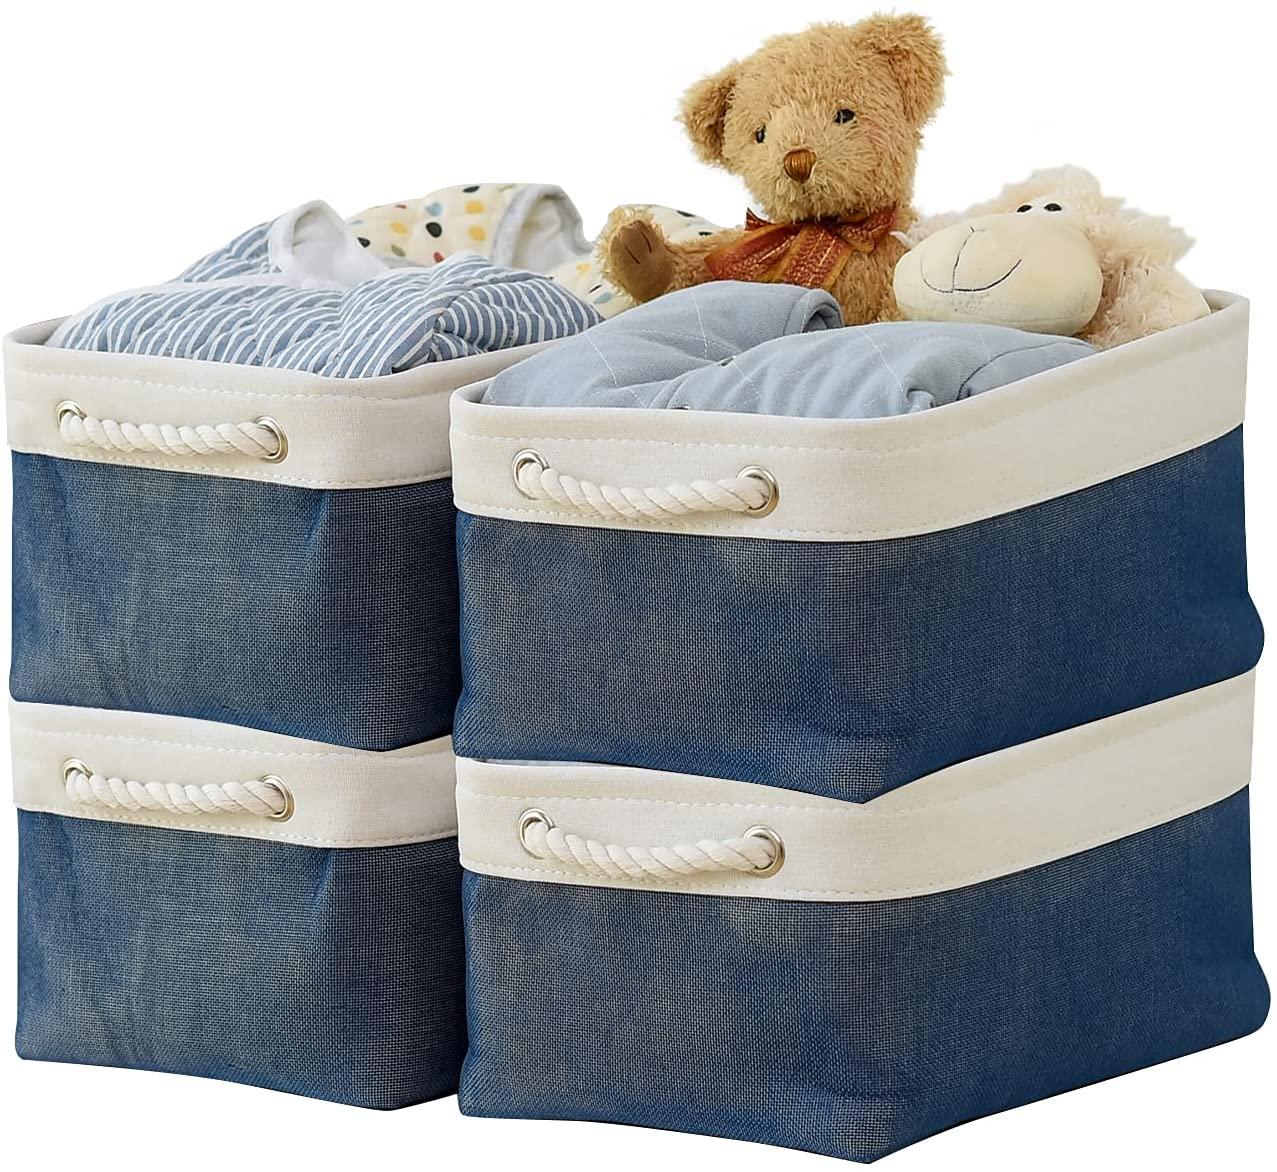 Samketel صندوق تخزين قابل للطي قابل للطي قوي سلة تخزين من القماش مكعب ث/مقابض لتنظيم رف الحضانة المنزل